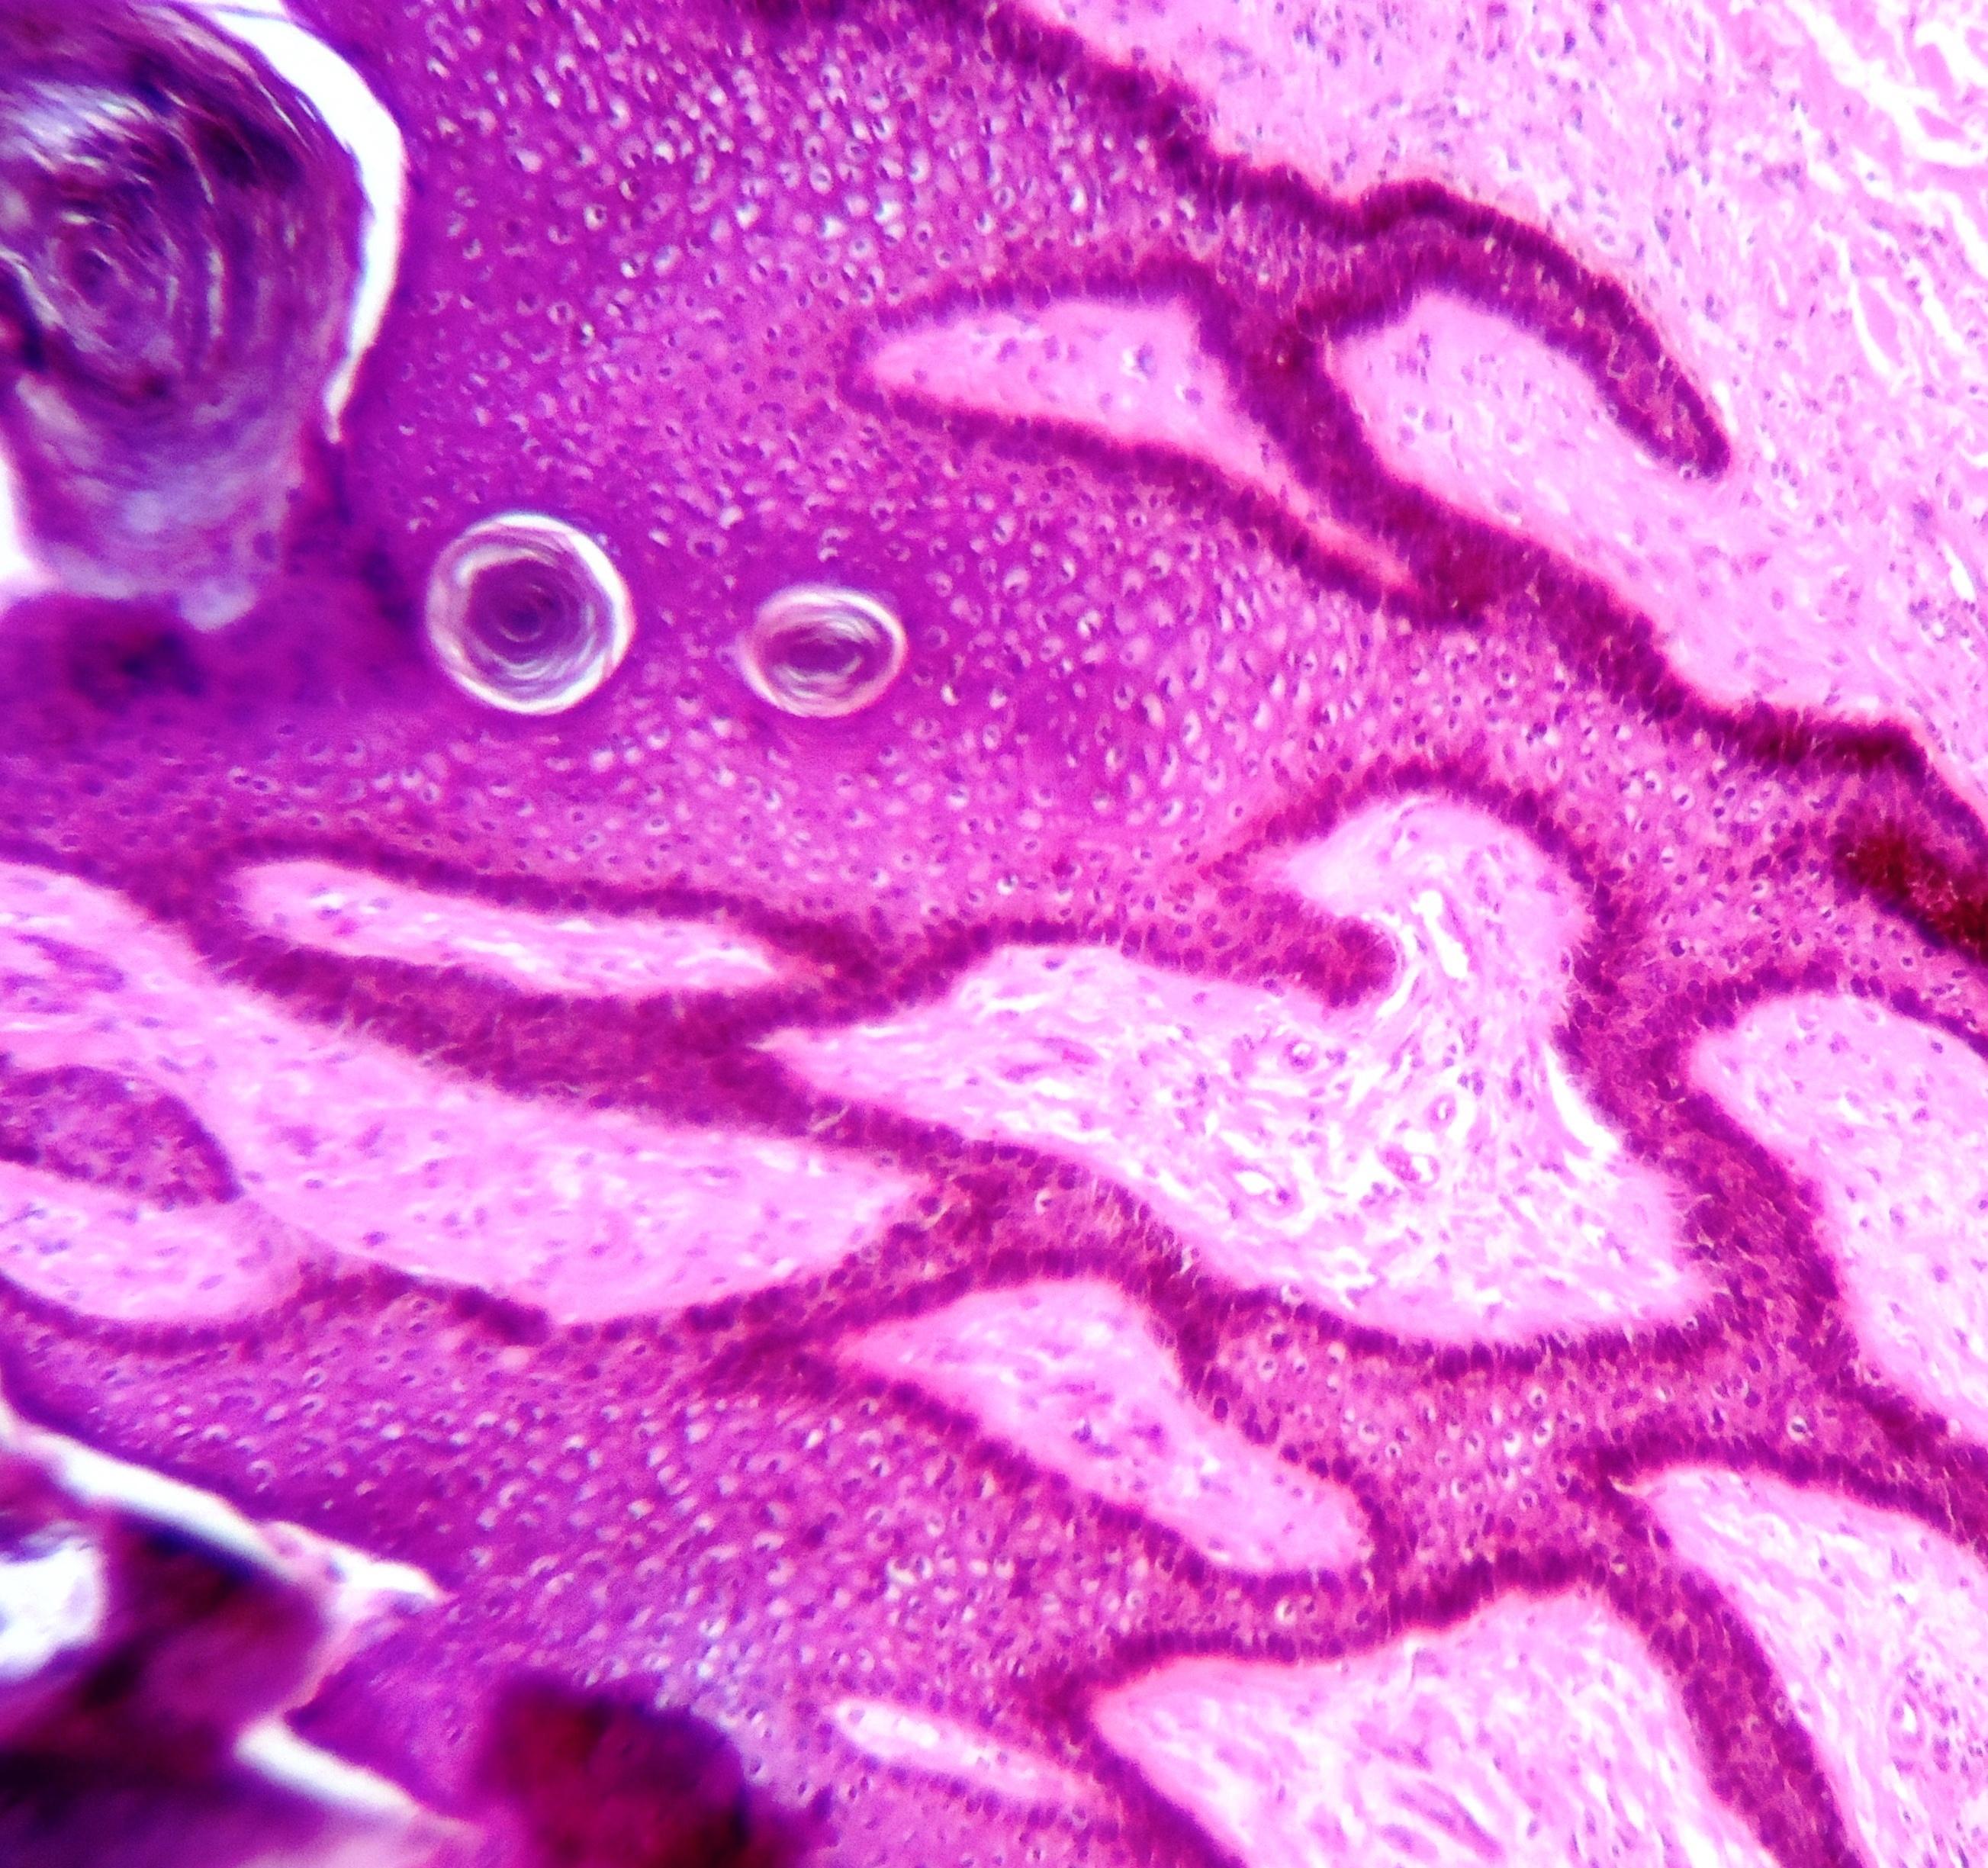 condyloma acuminata histology poate elimina alunițele papilomelor